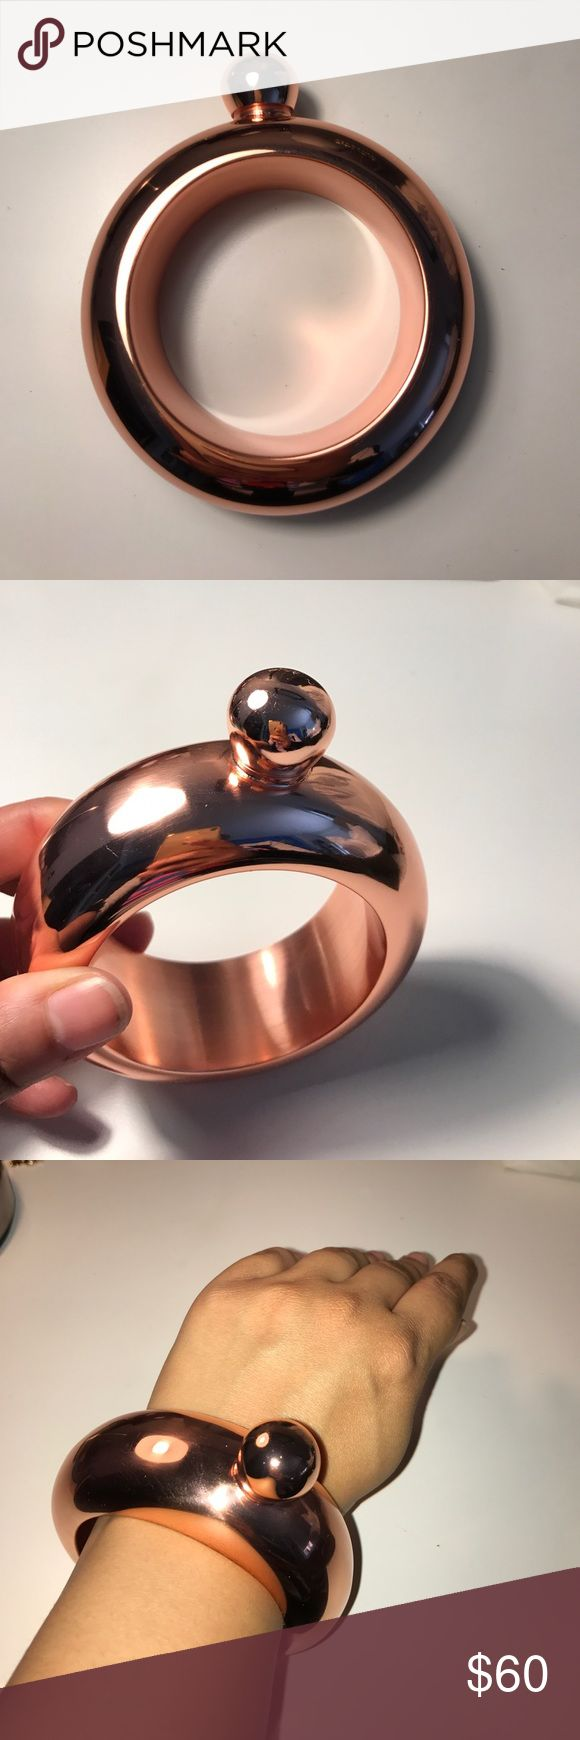 Rose Gold Flask Bracelet ❗️New in Box❗️ Super Cute Rose Gold Flask Bracelet. Funnel included. Holds 3oz of liquid. ❗️New in Box❗️ Jewelry Bracelets